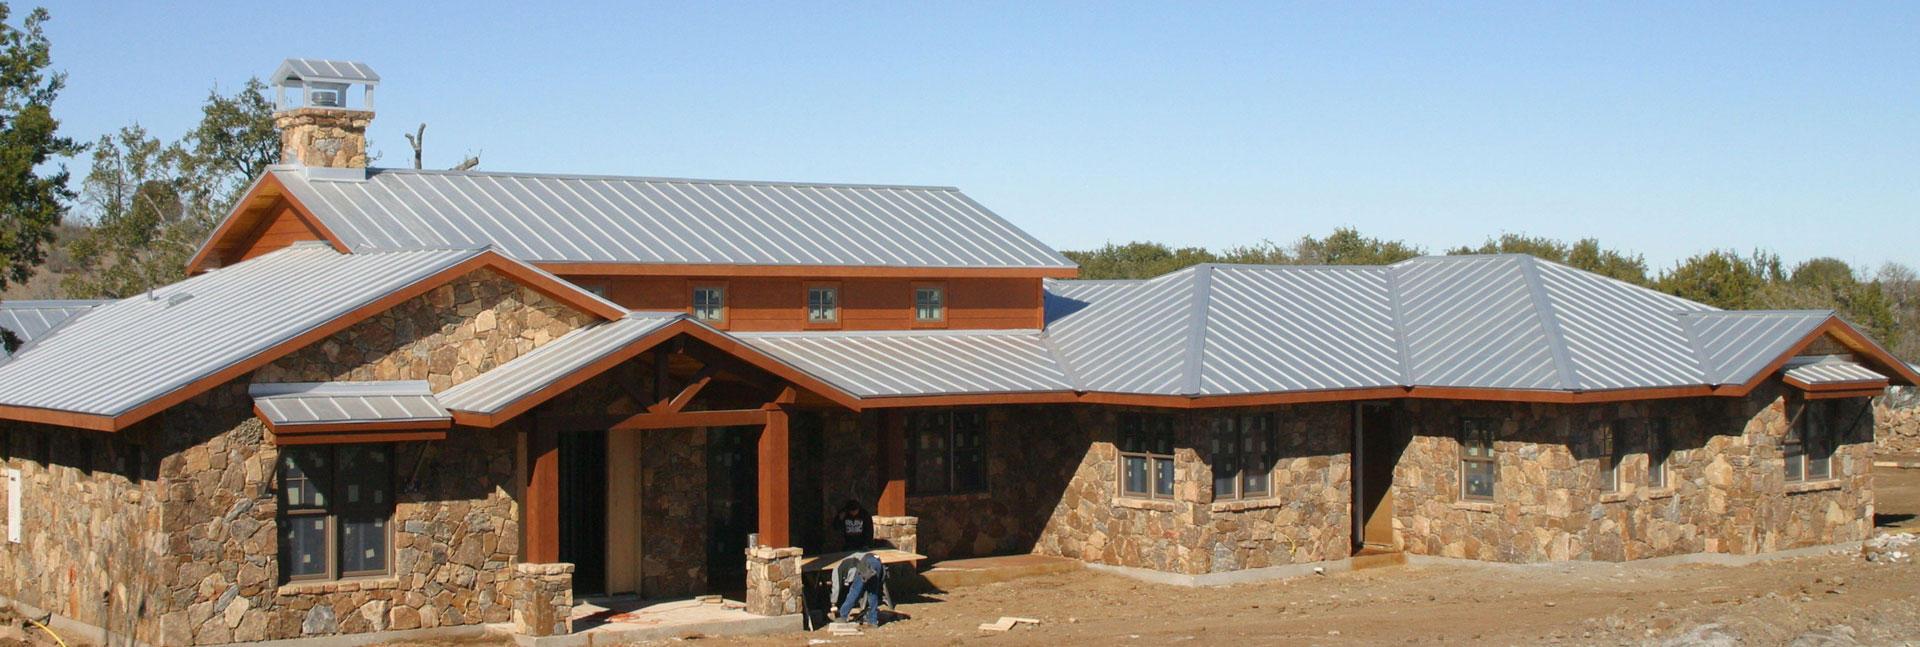 Tucson Roof Gurus 1 Roofing Contractor In Tucson Amp S Az